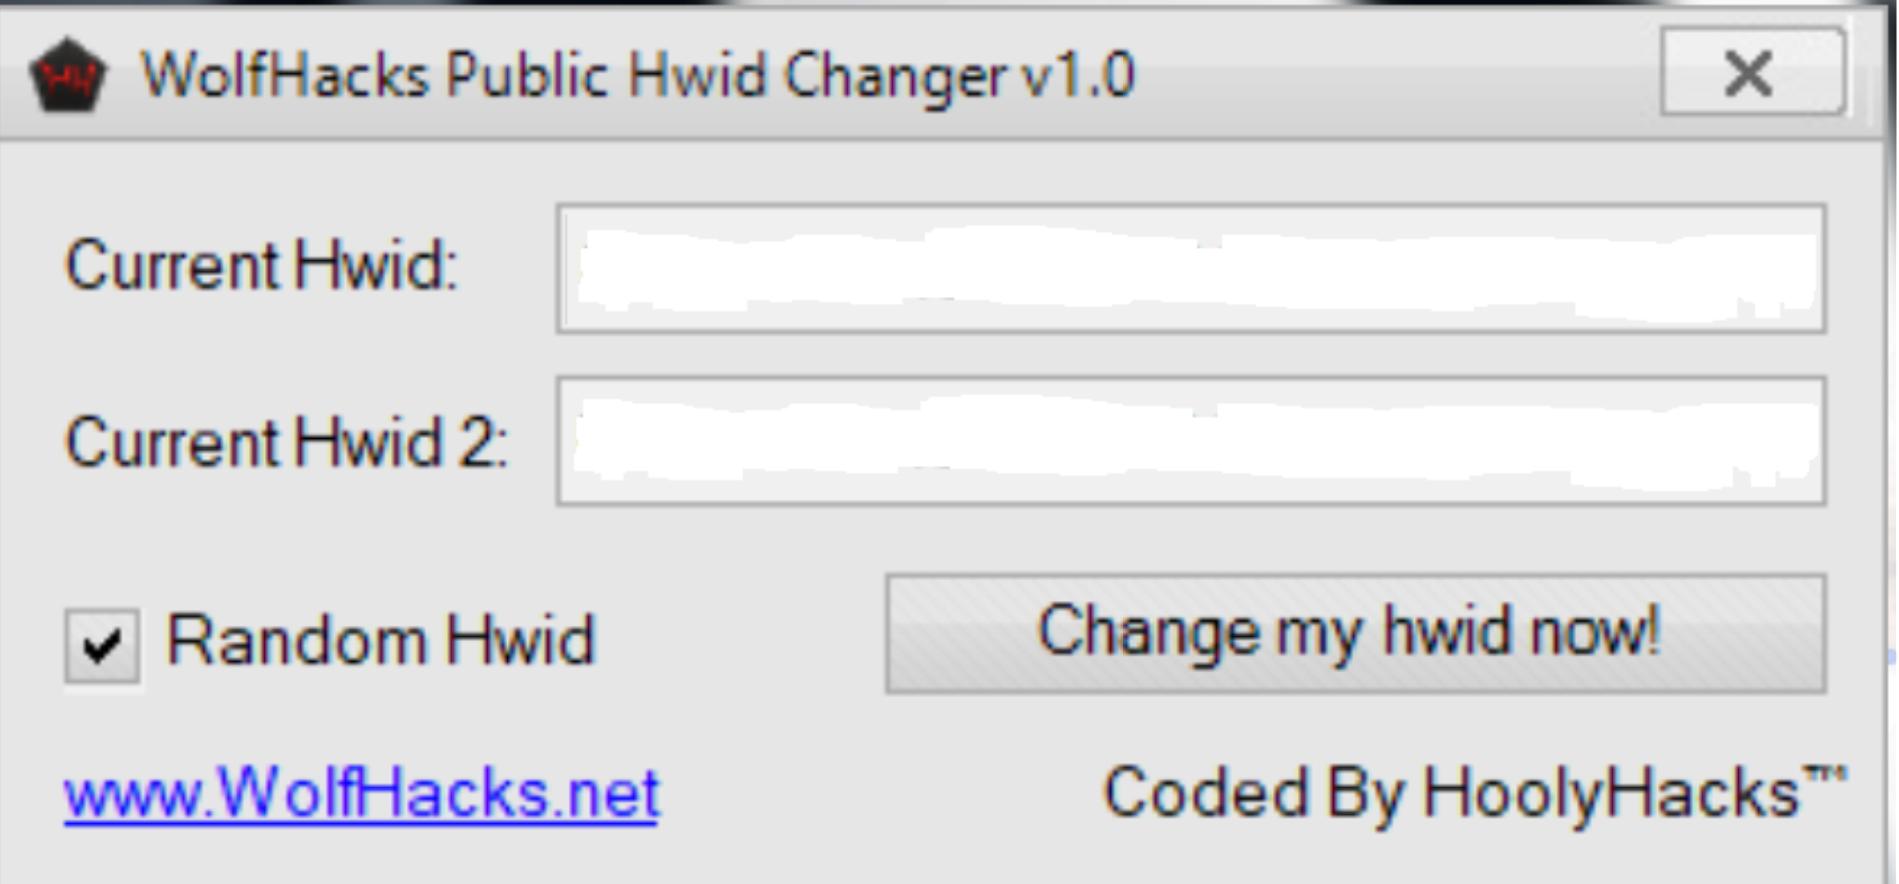 Hwid Changer Unknowncheats